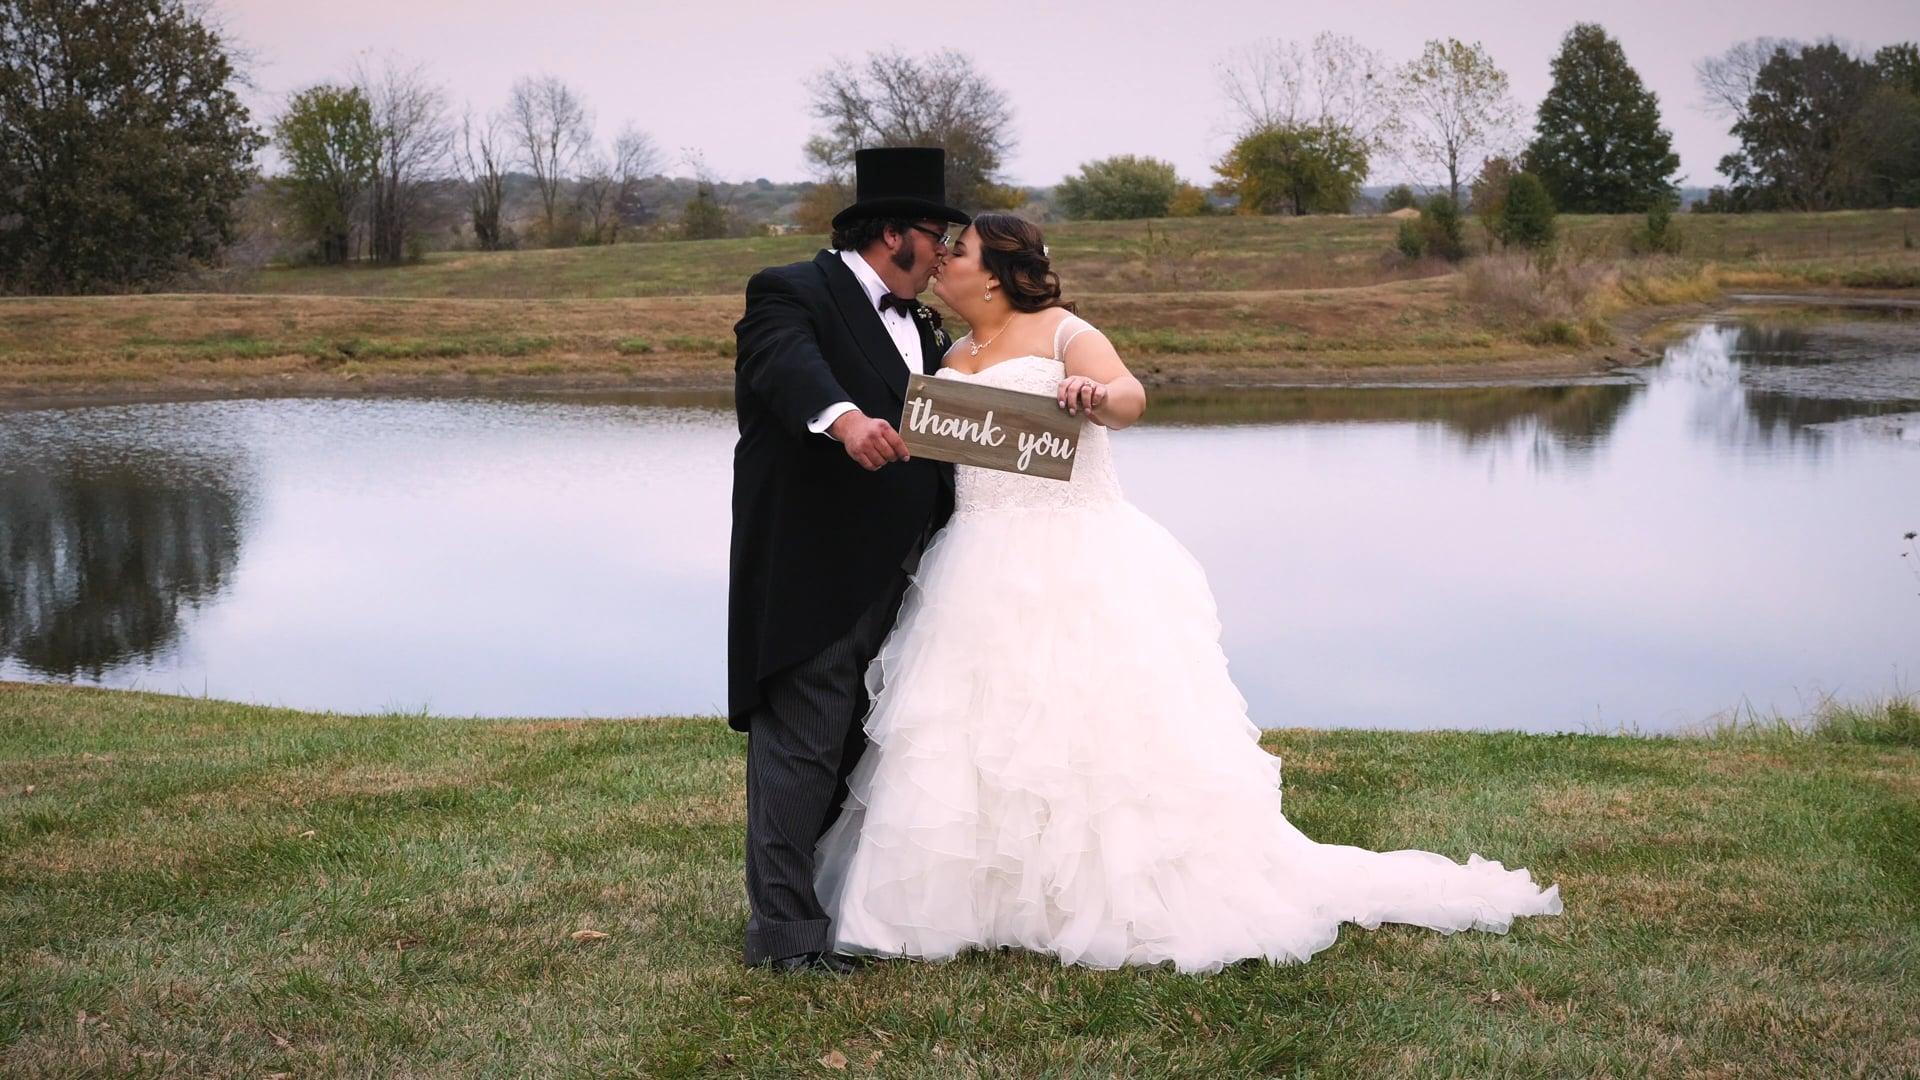 Sara & John 10172020 - Soul Fuel Weddings